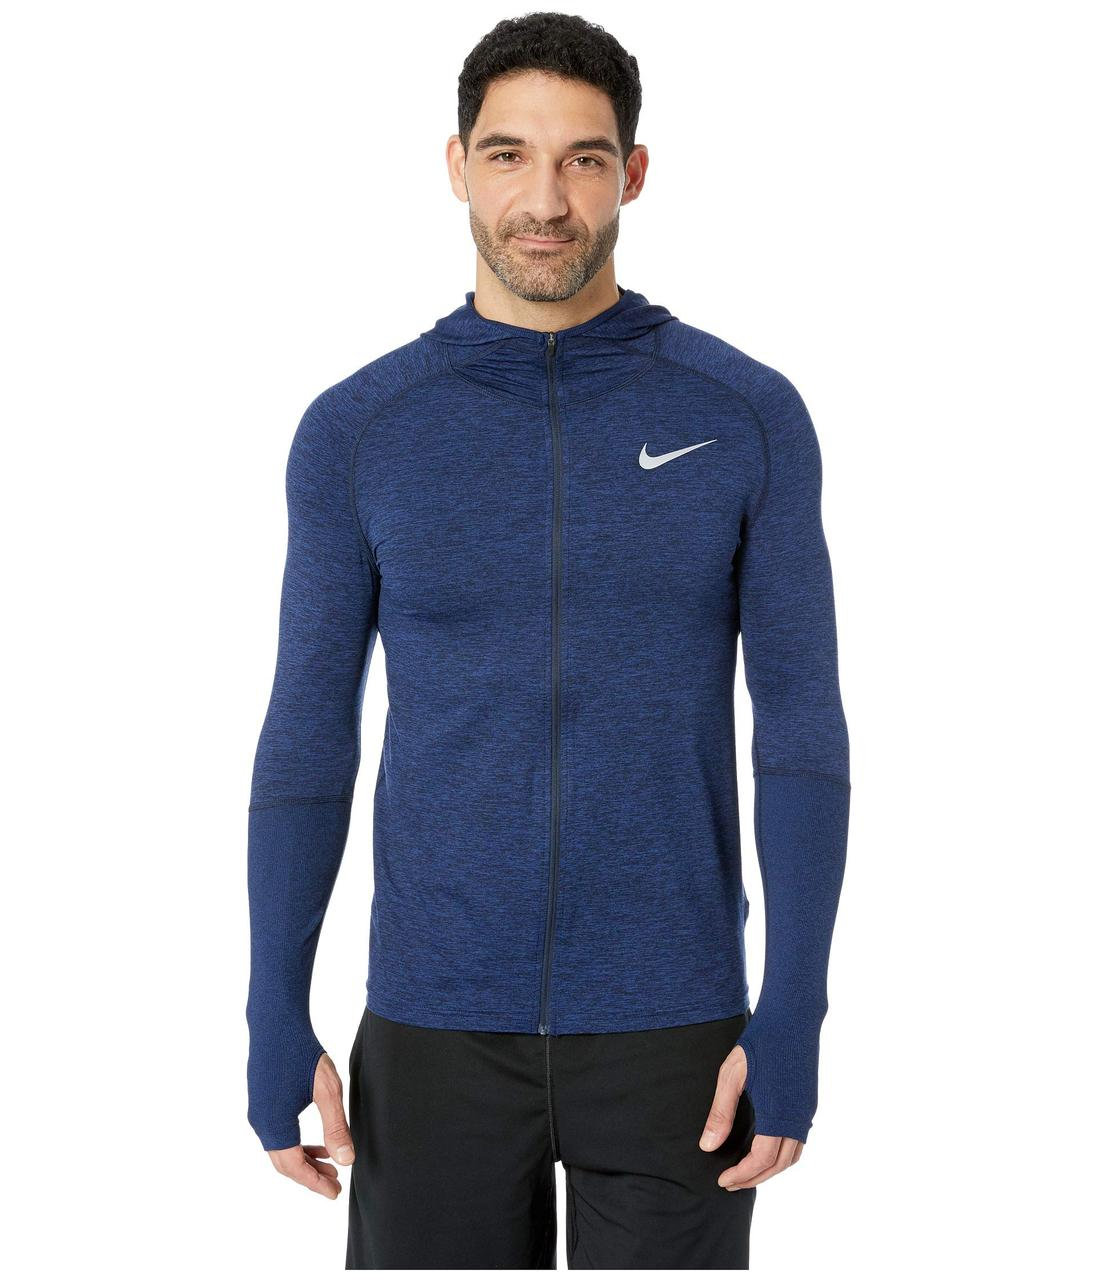 6bb7cb02 Толстовка Nike Element Full Zip Hoodie Blue - Оригинал - FAIR -  оригинальная одежда и обувь